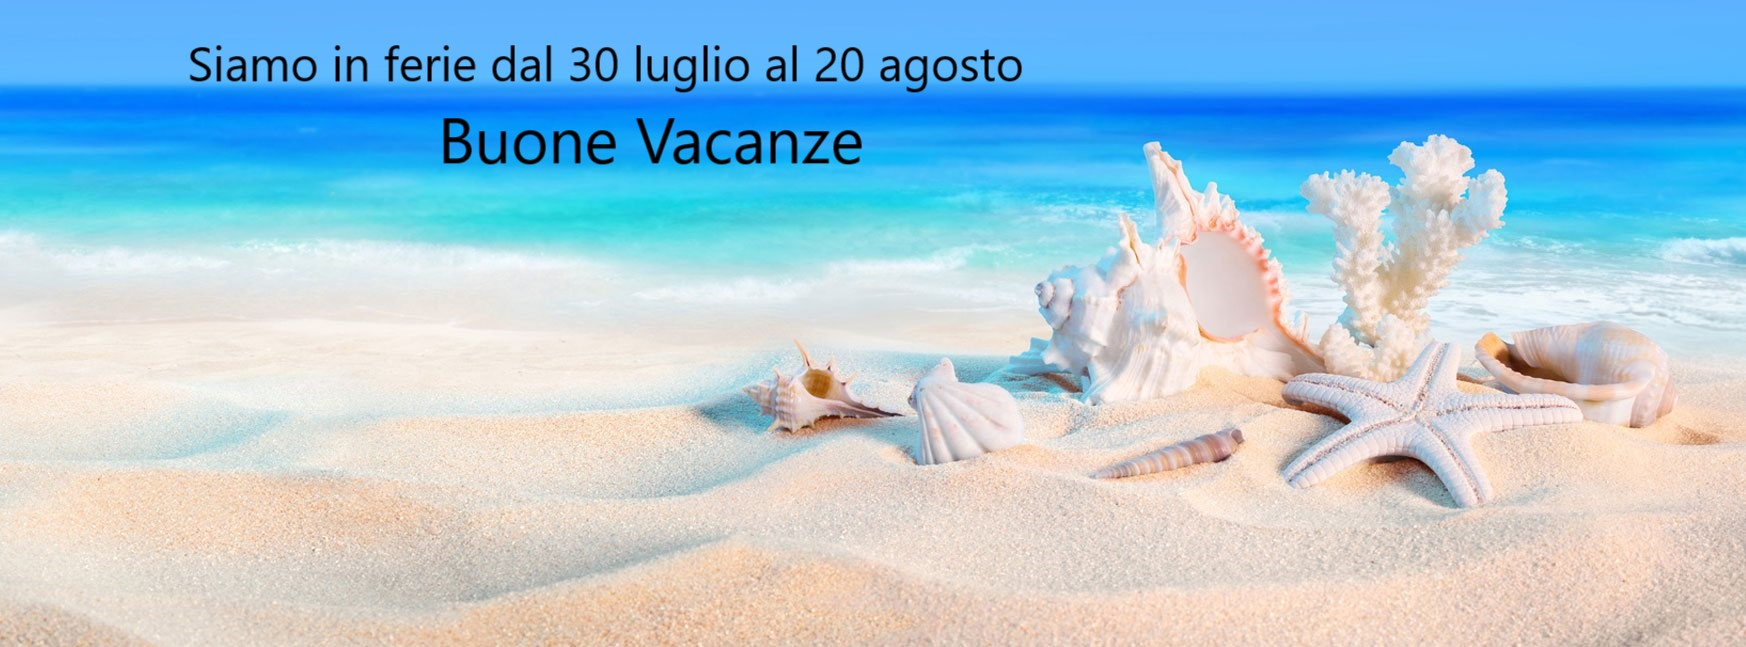 vacanze_mare-azimut-2018